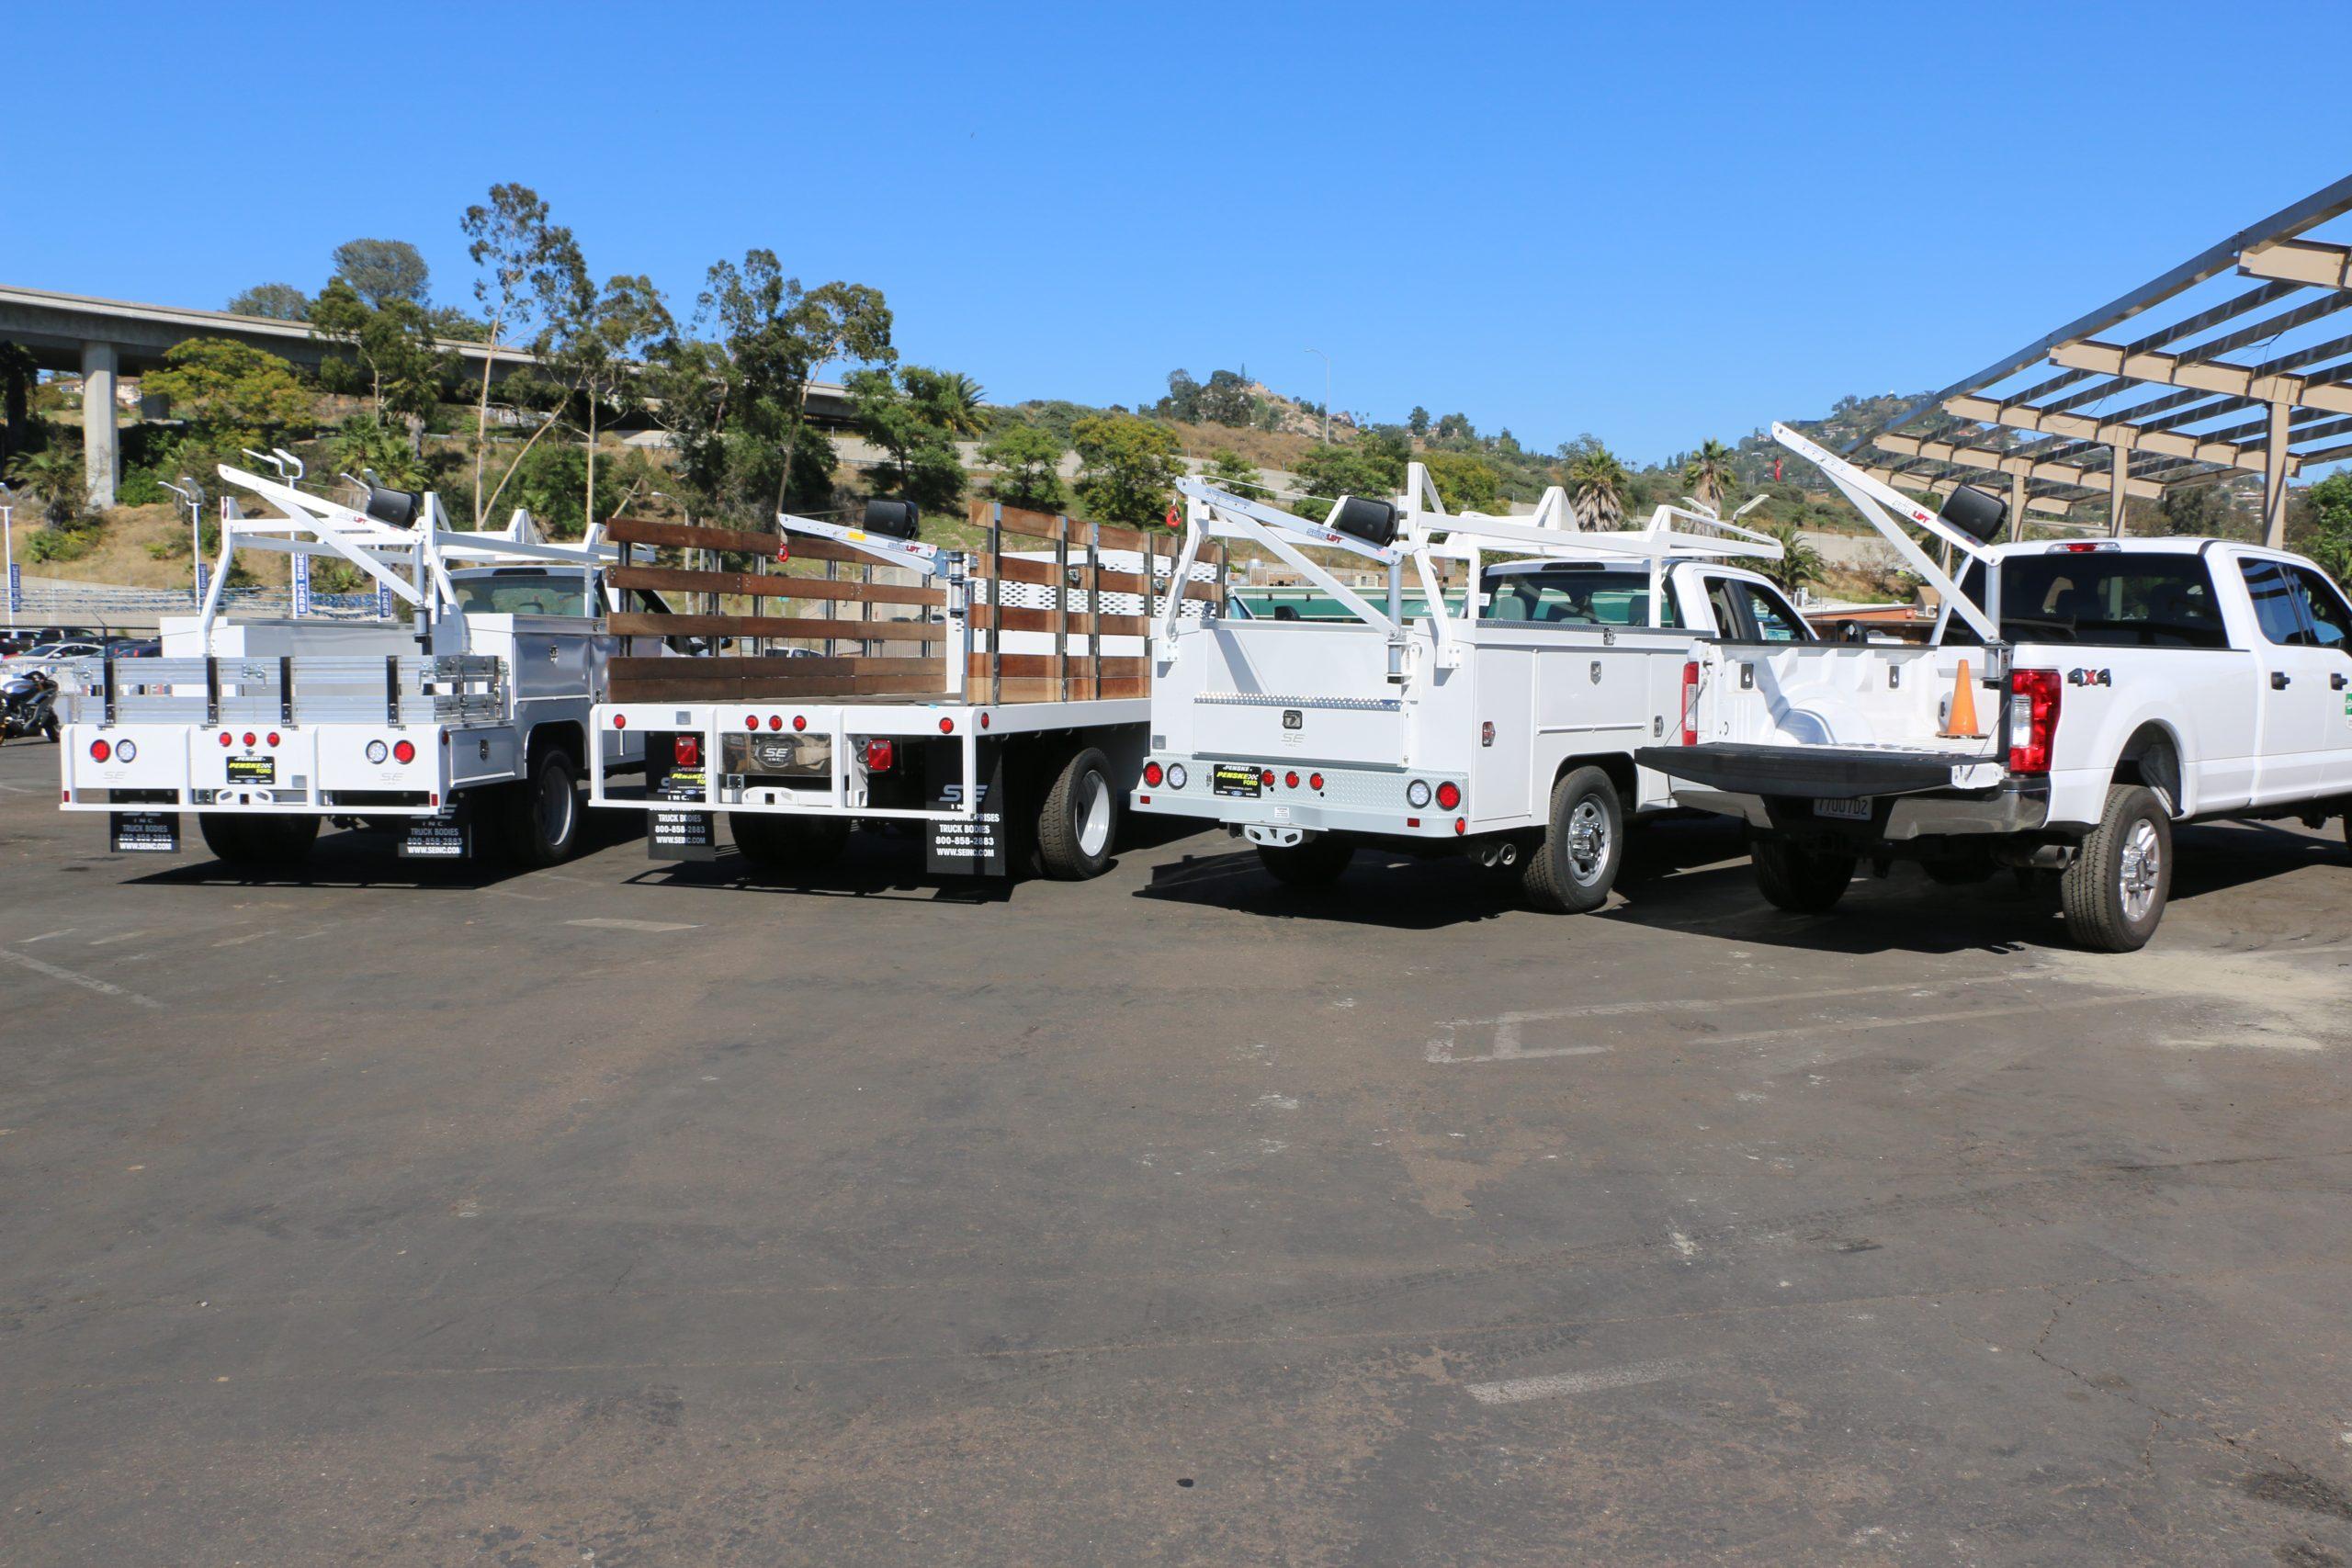 Spitzlift Crane Vehicle Applications